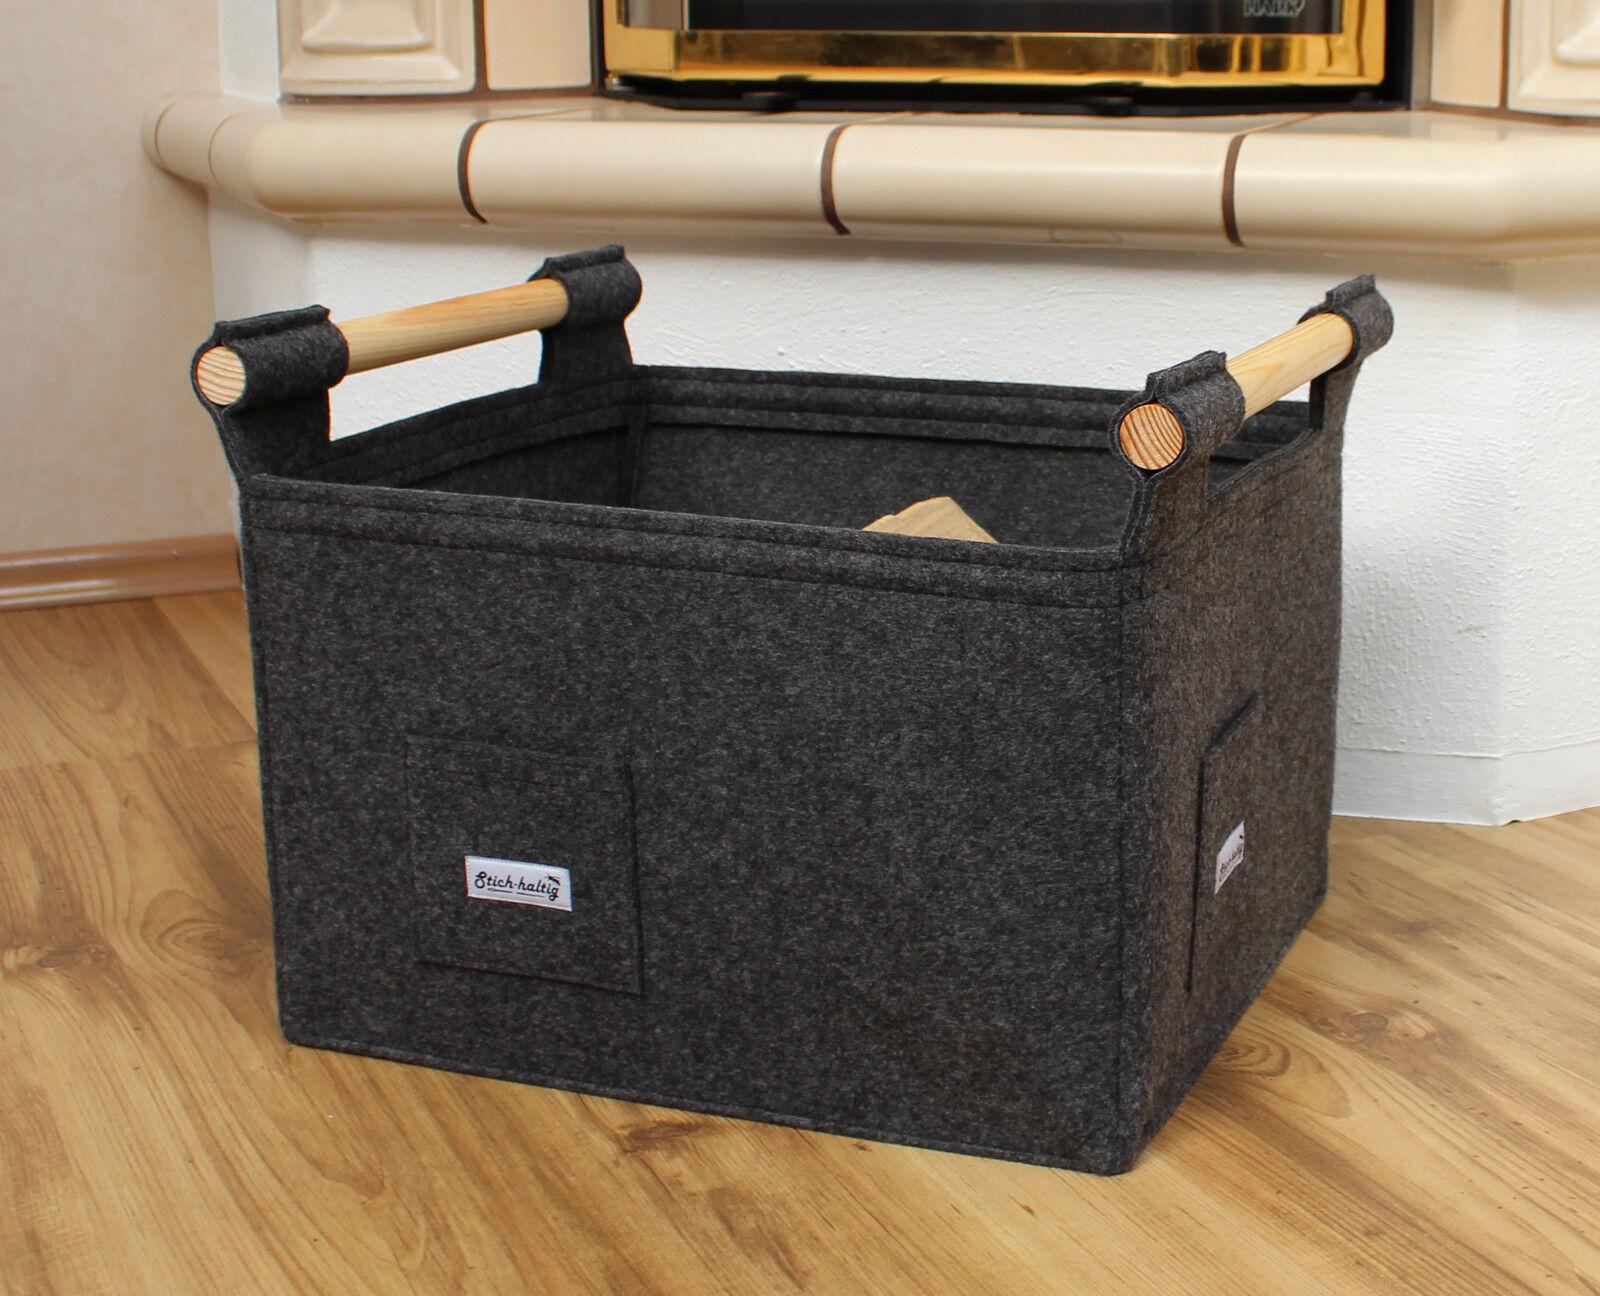 feuerholzkorb holzgriff ofen kamin filz tasche kaminkorb. Black Bedroom Furniture Sets. Home Design Ideas